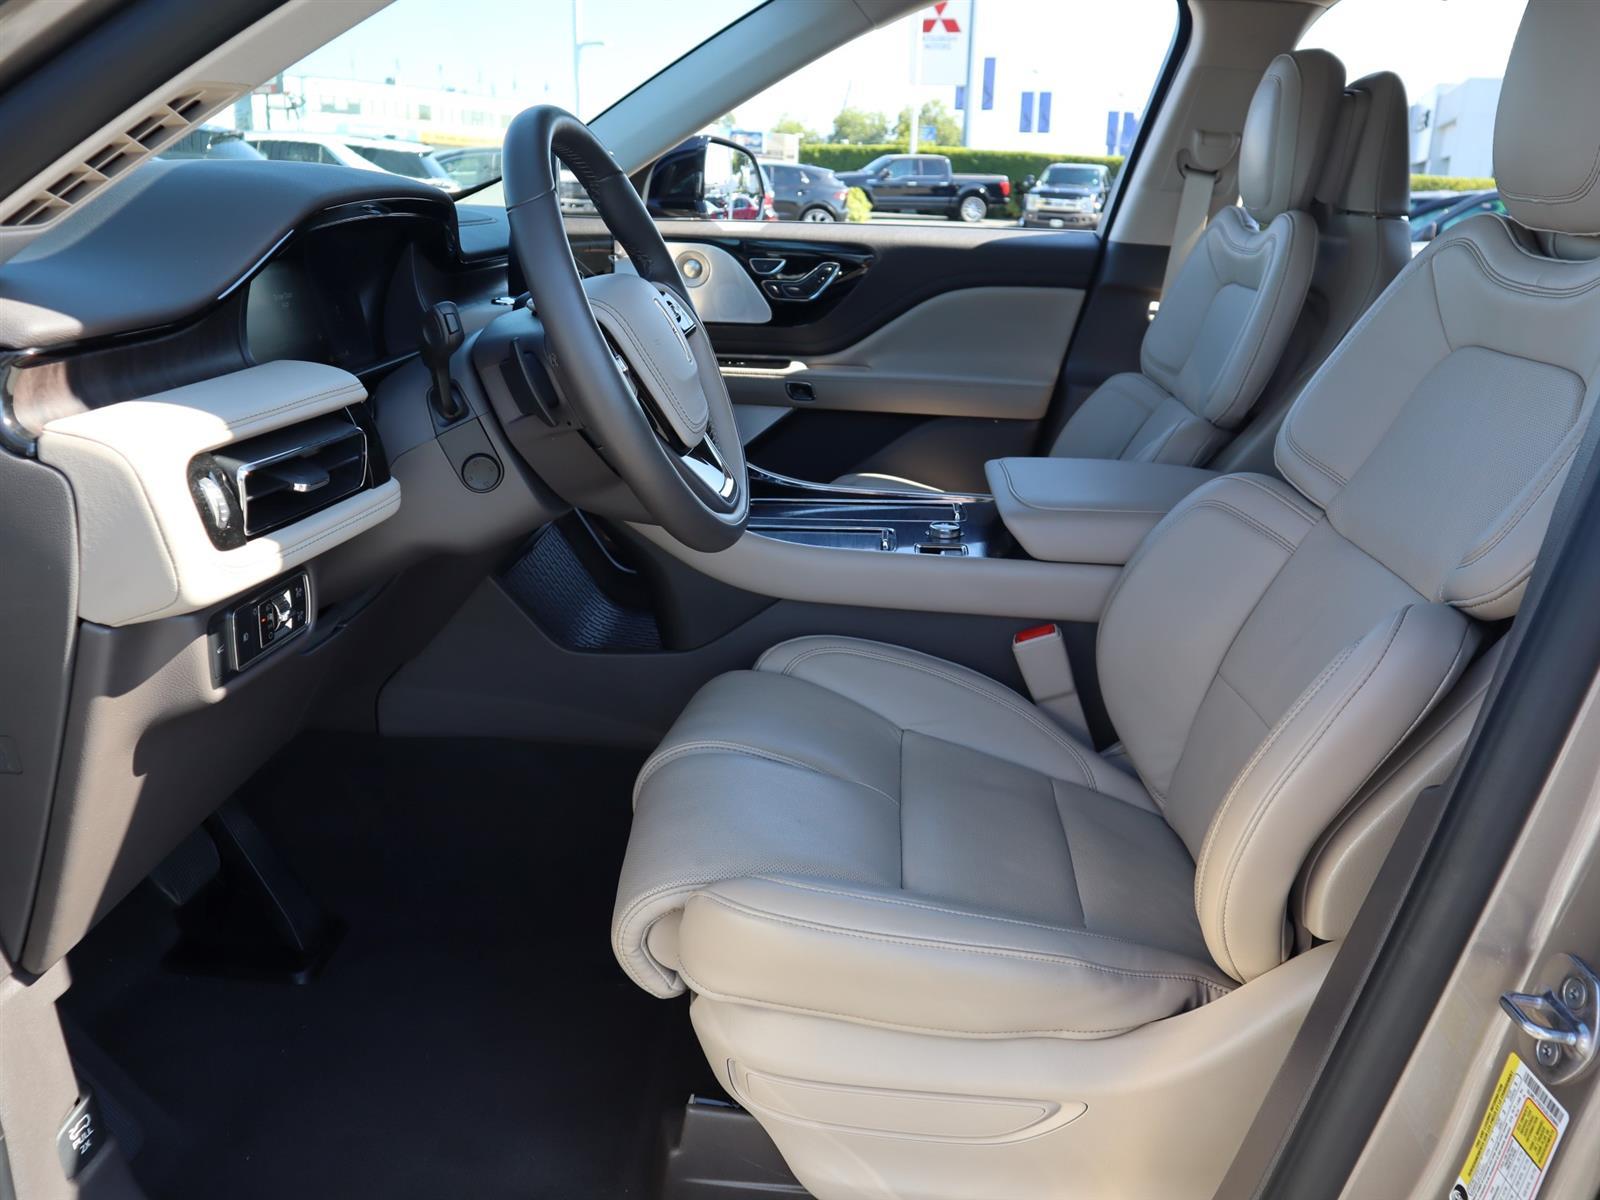 2020 Lincoln AVIATOR RESERVE